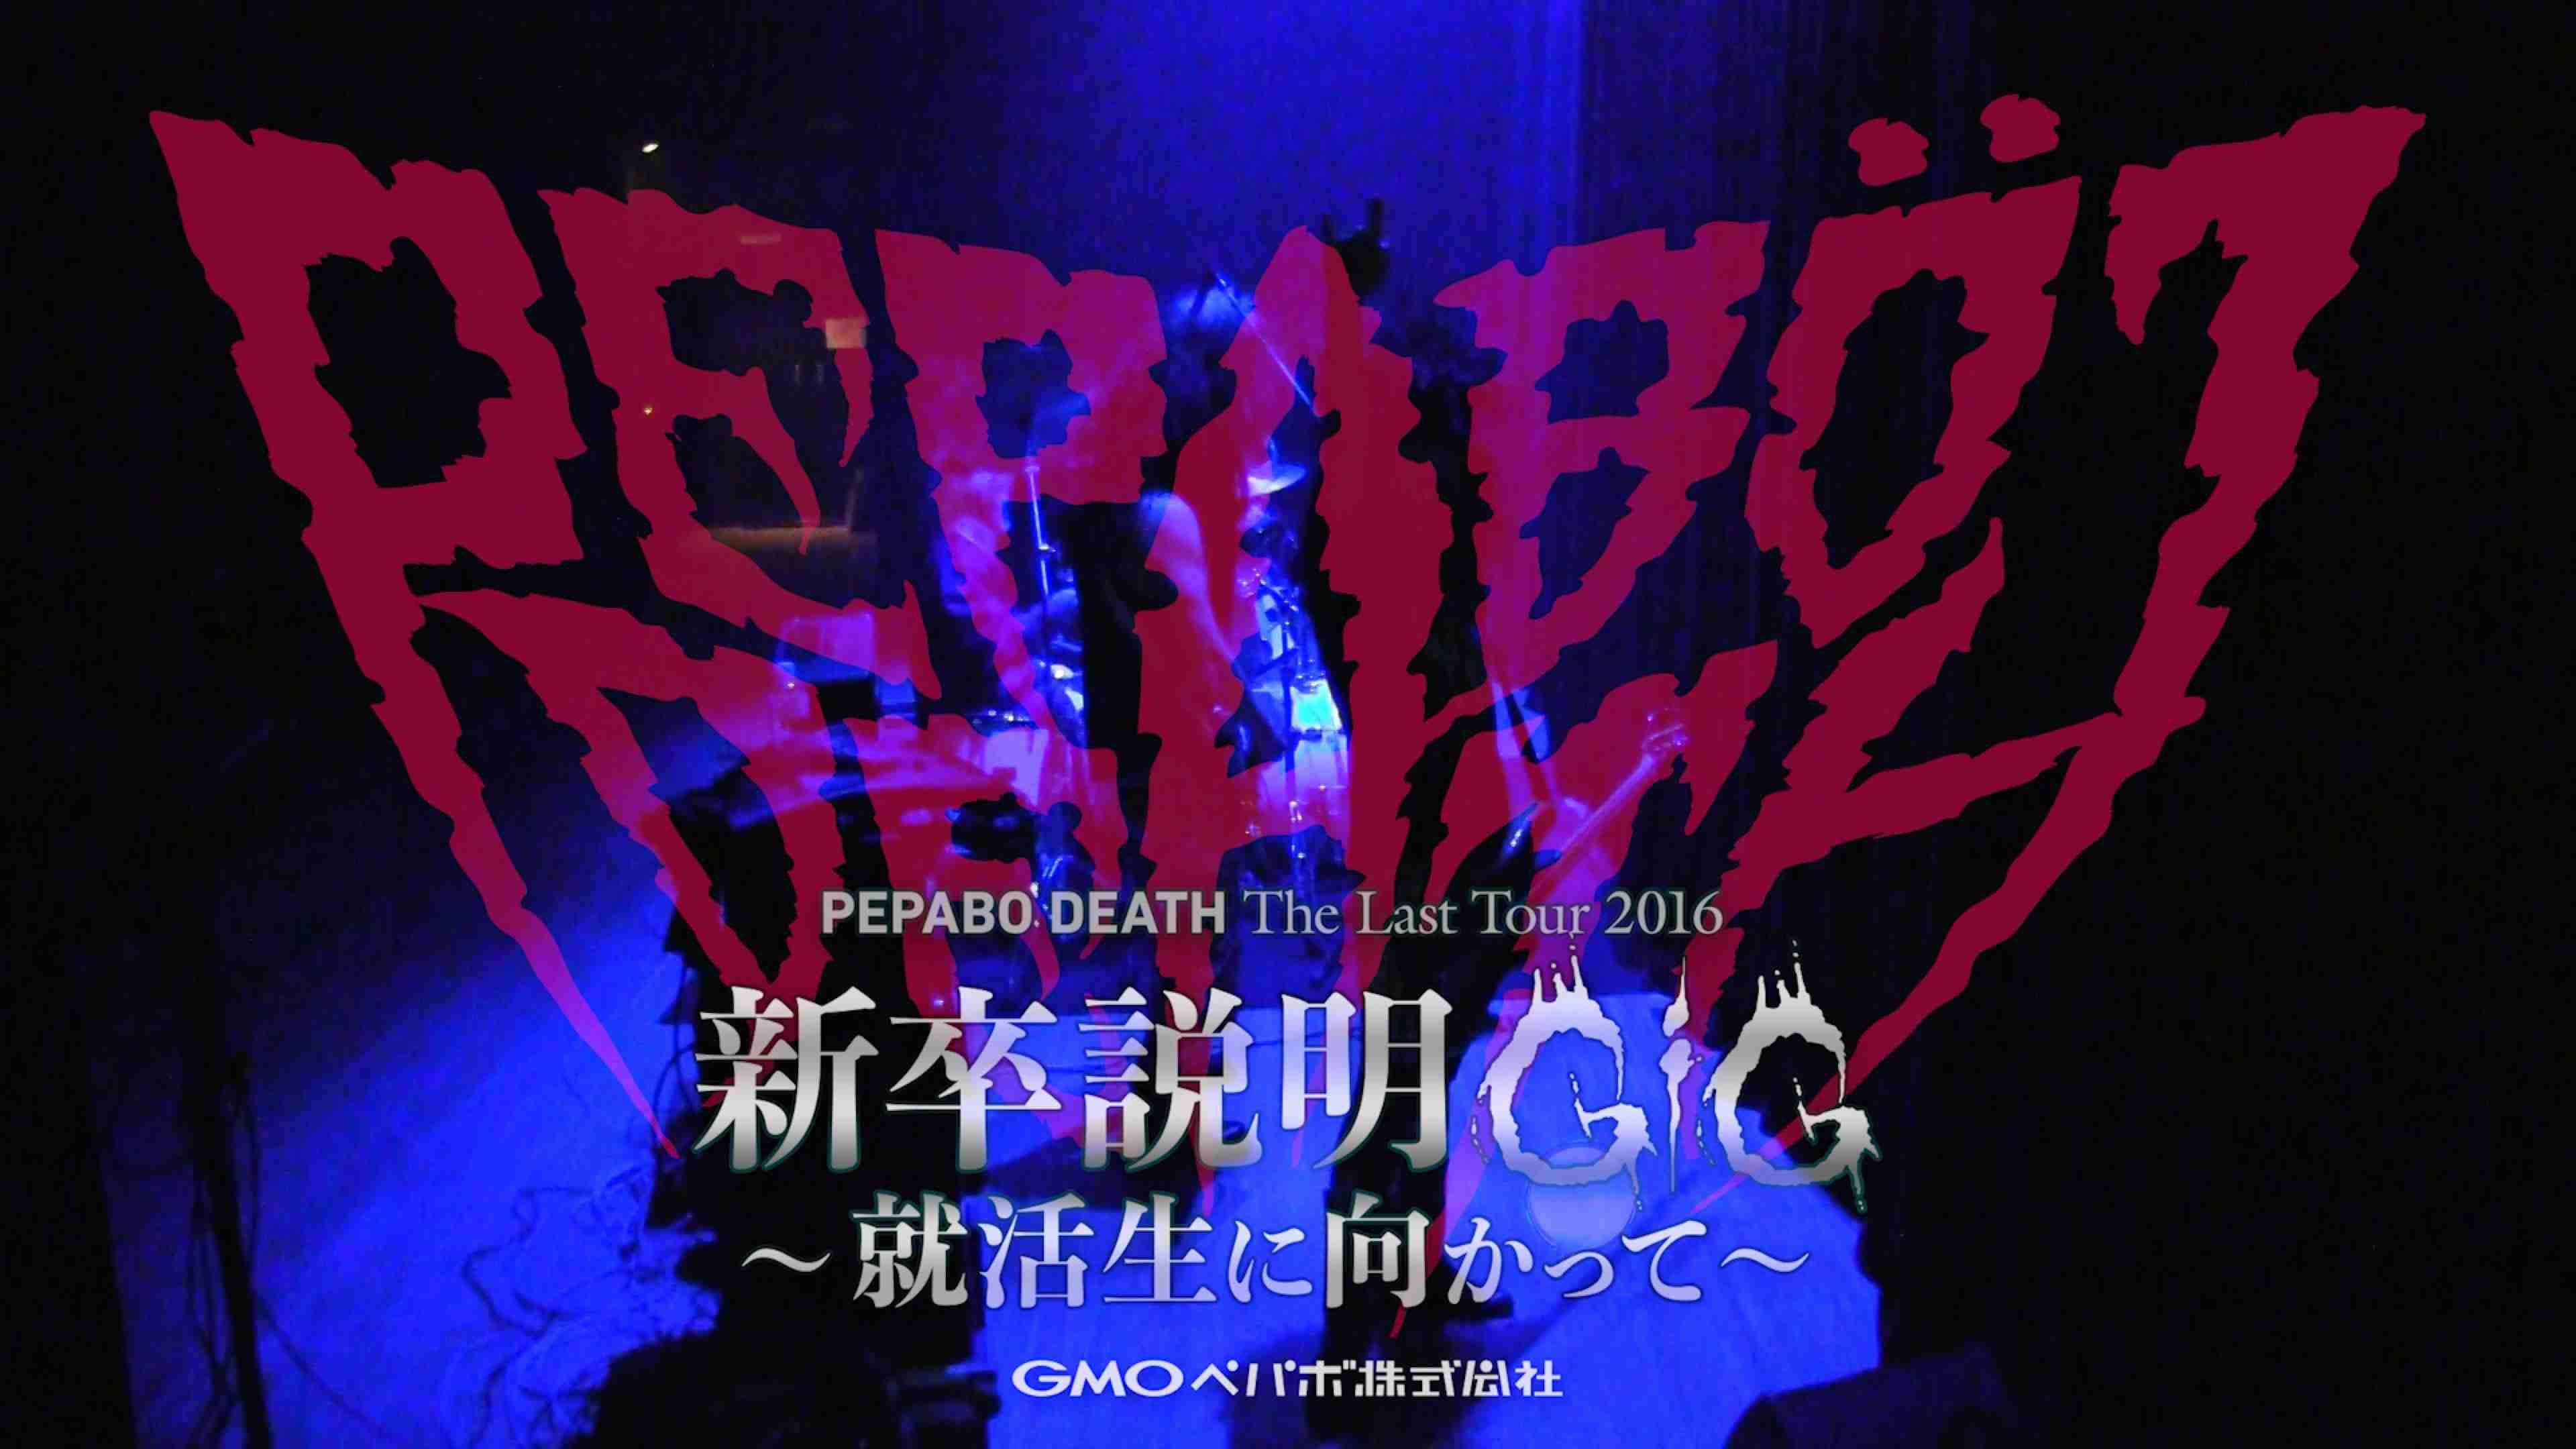 pepabo death - YouTube